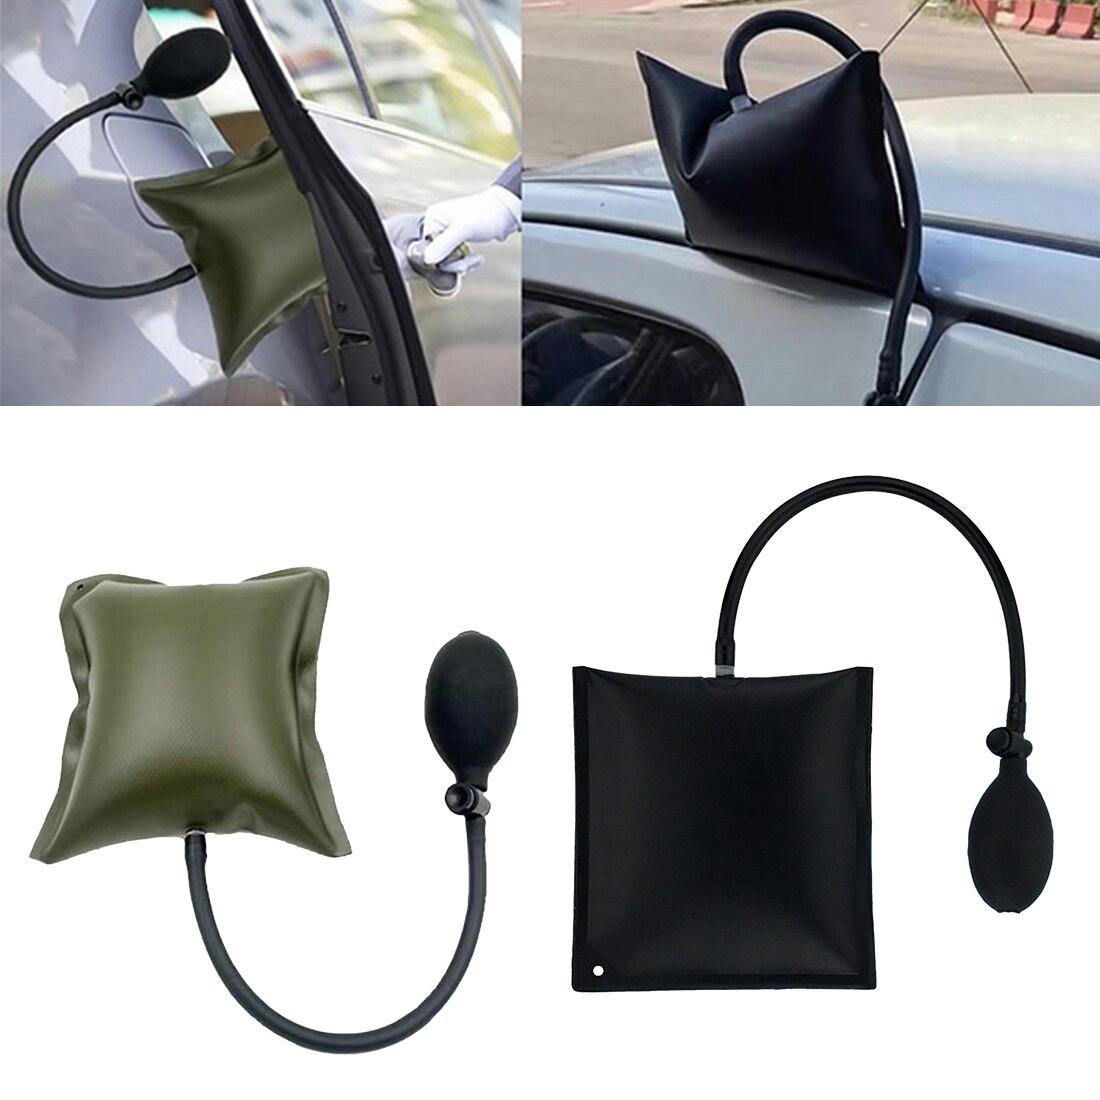 Adjustable Car Air Pump Auto Repair Tool Thickened Car Door Repair Air Cushion Emergency Open Unlock Tool Kit